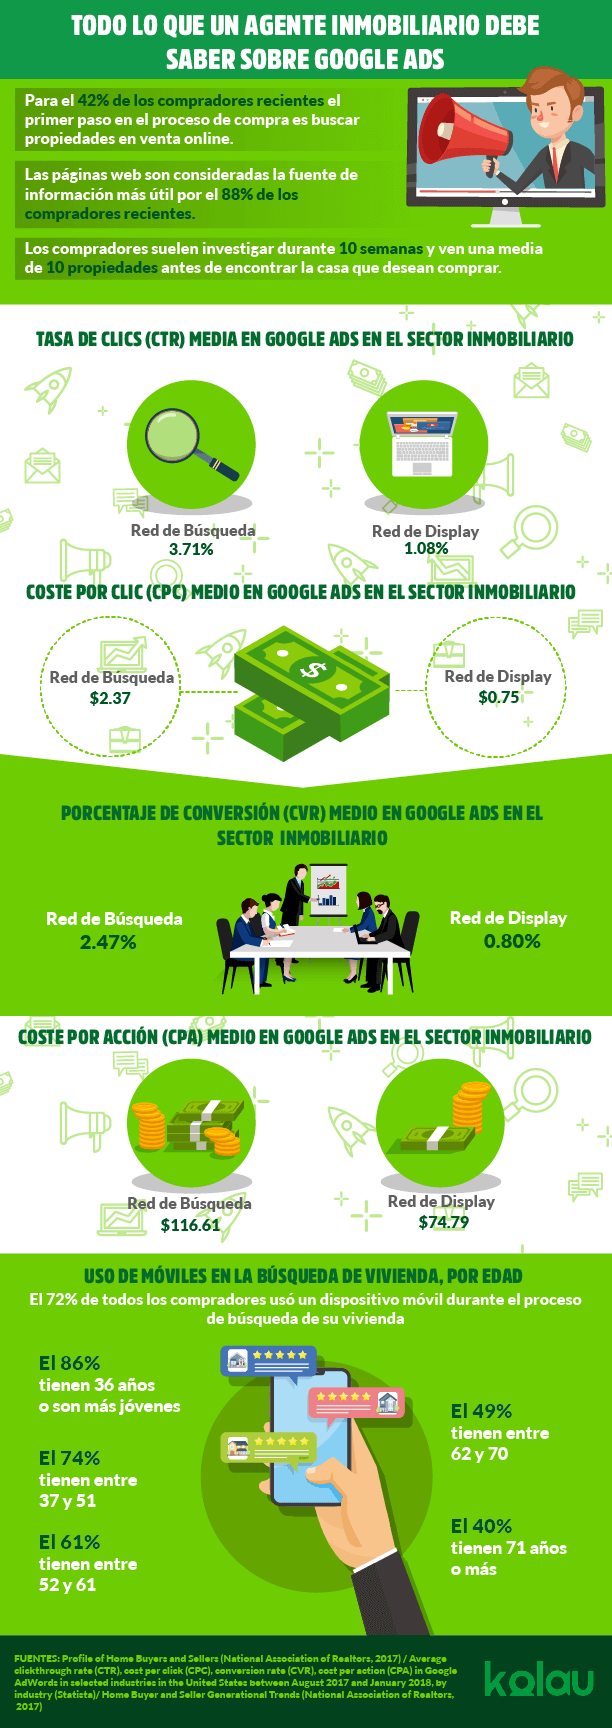 Infografia-google-ads-para-inmobialiarias